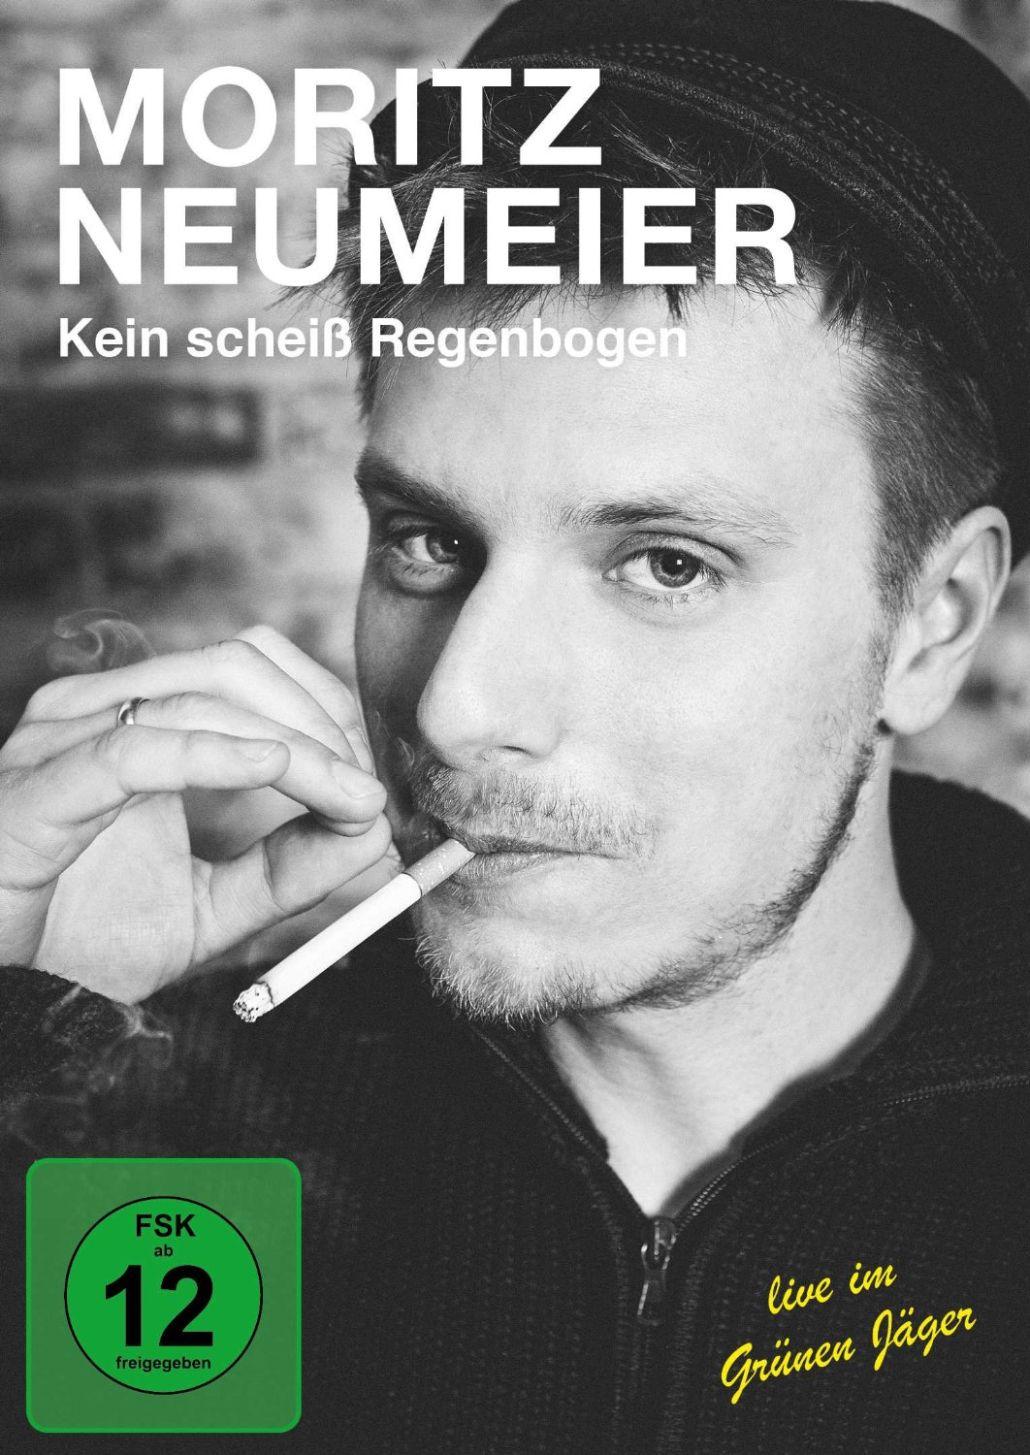 Moritz Neumeier: Zigarette statt Regenbogen